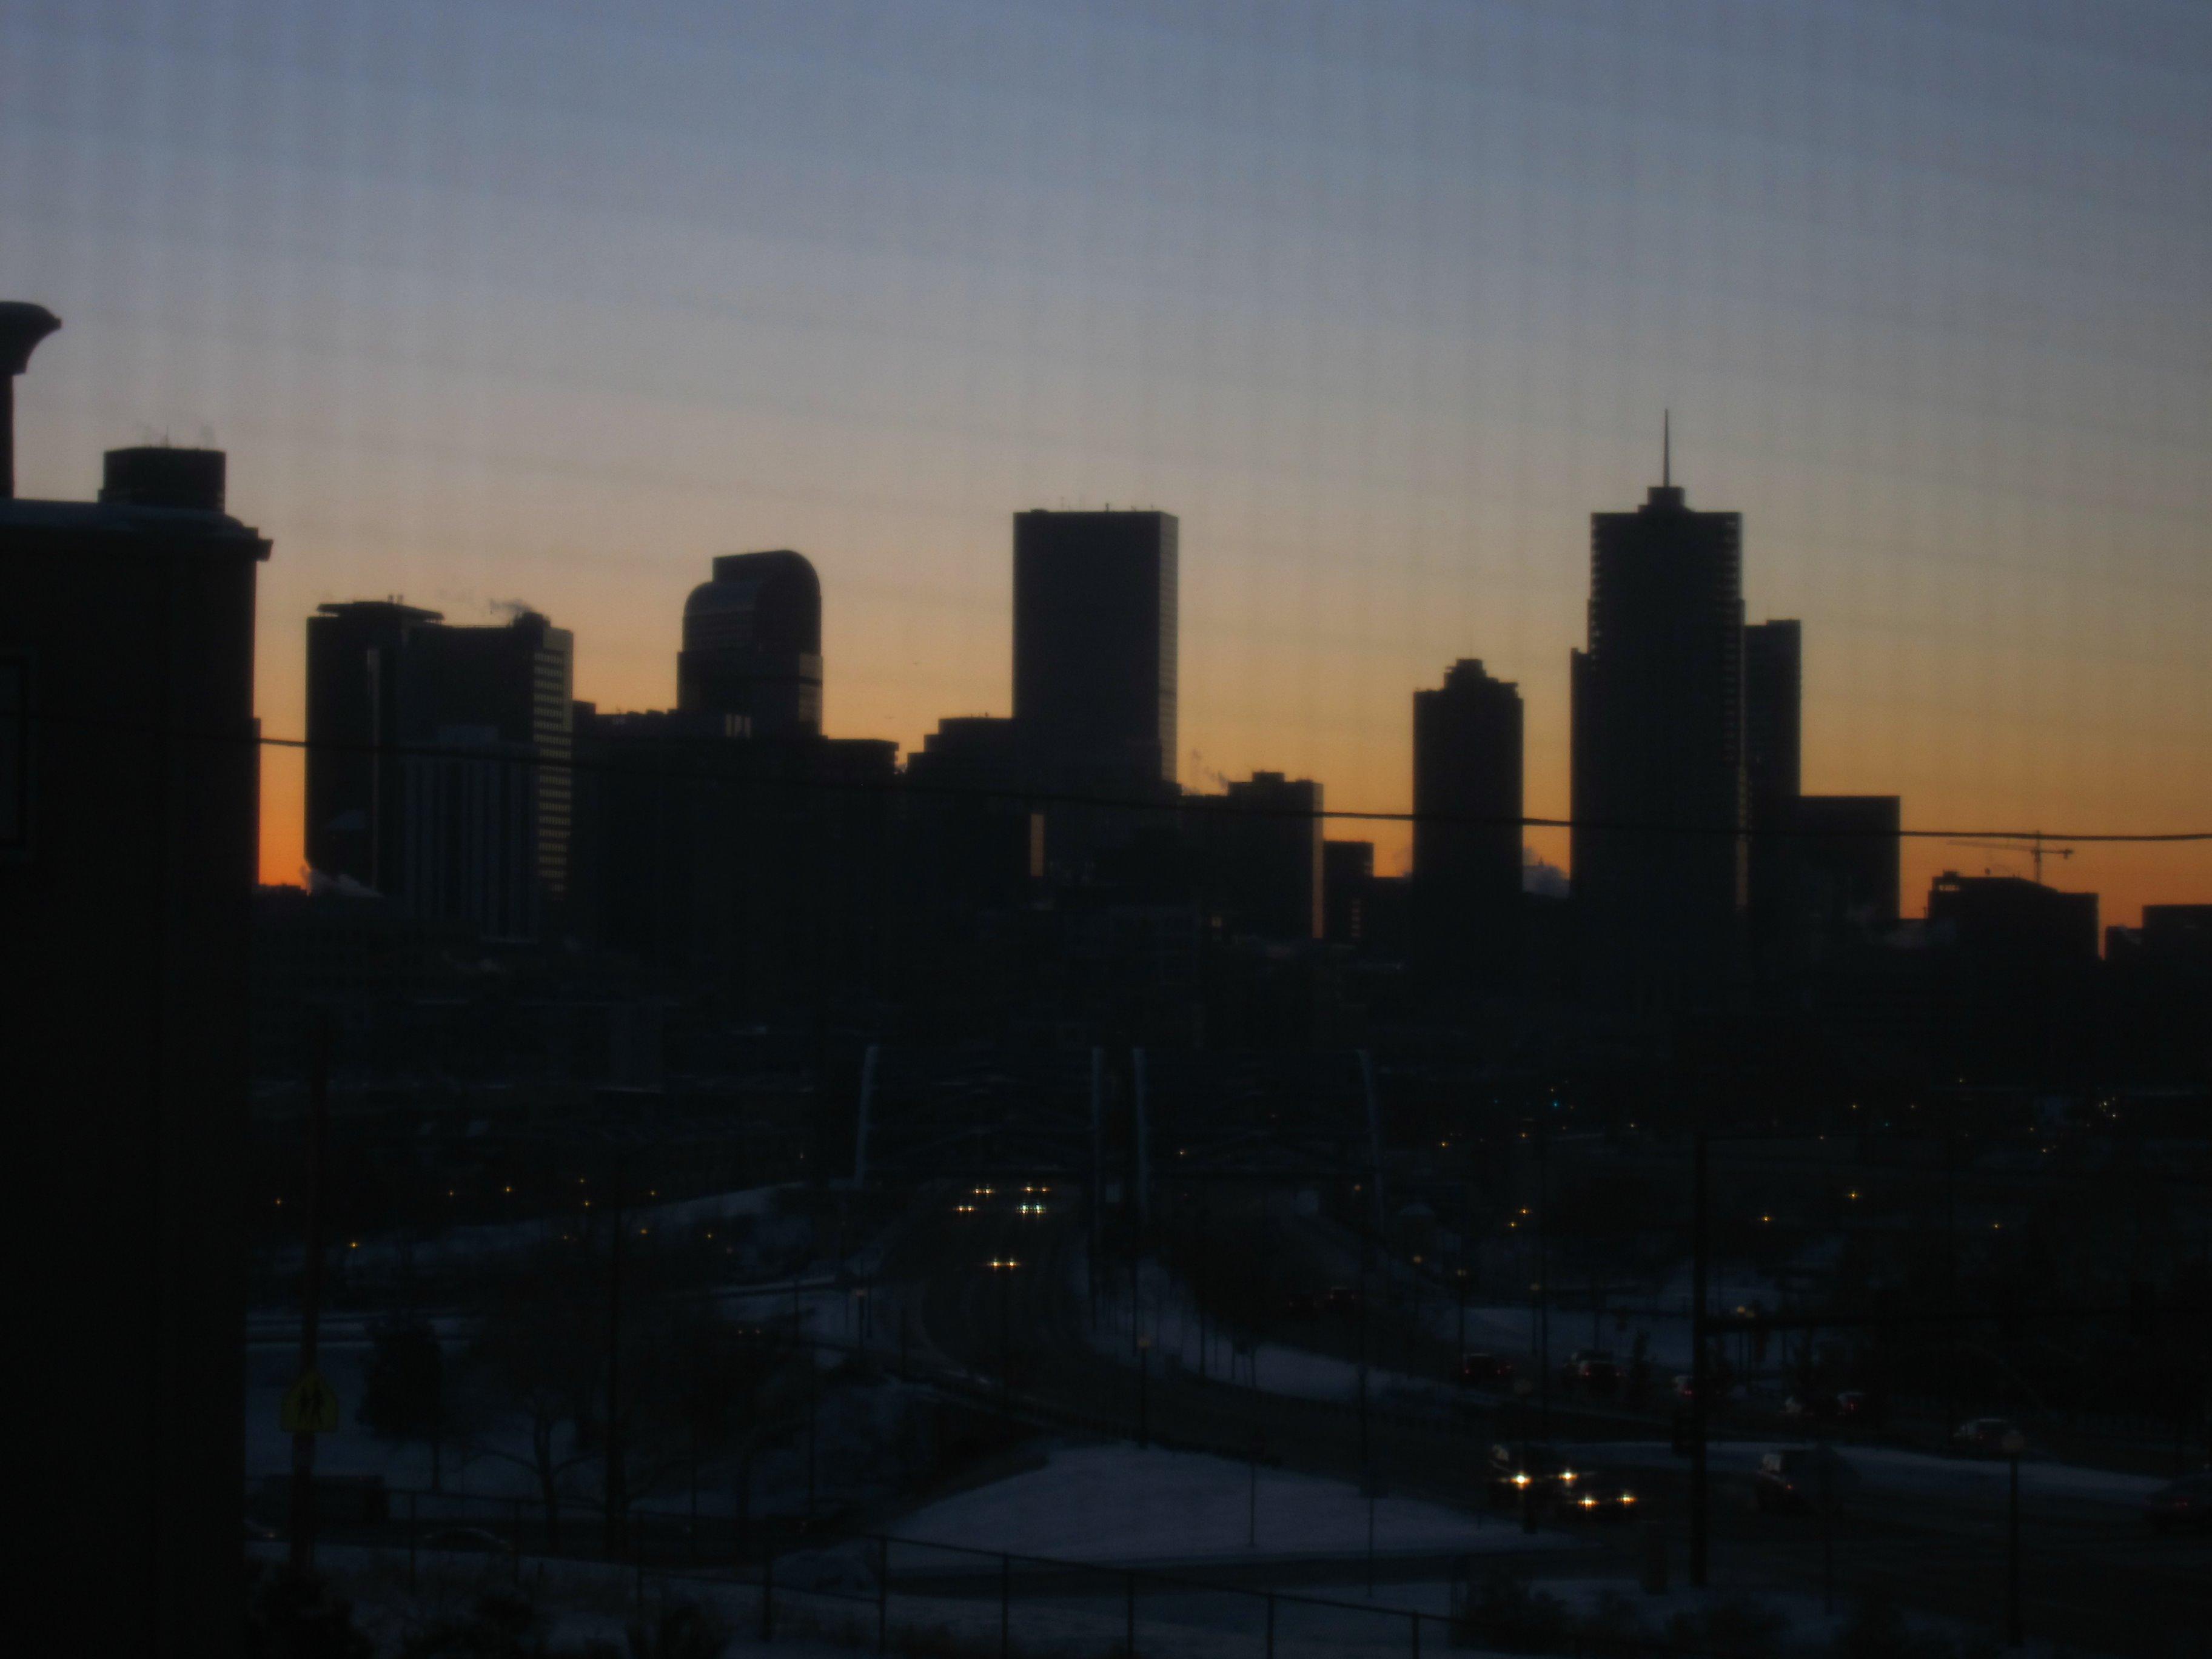 Denver sunrise, Sunrise, Usa, Skyline, Dusk, HQ Photo